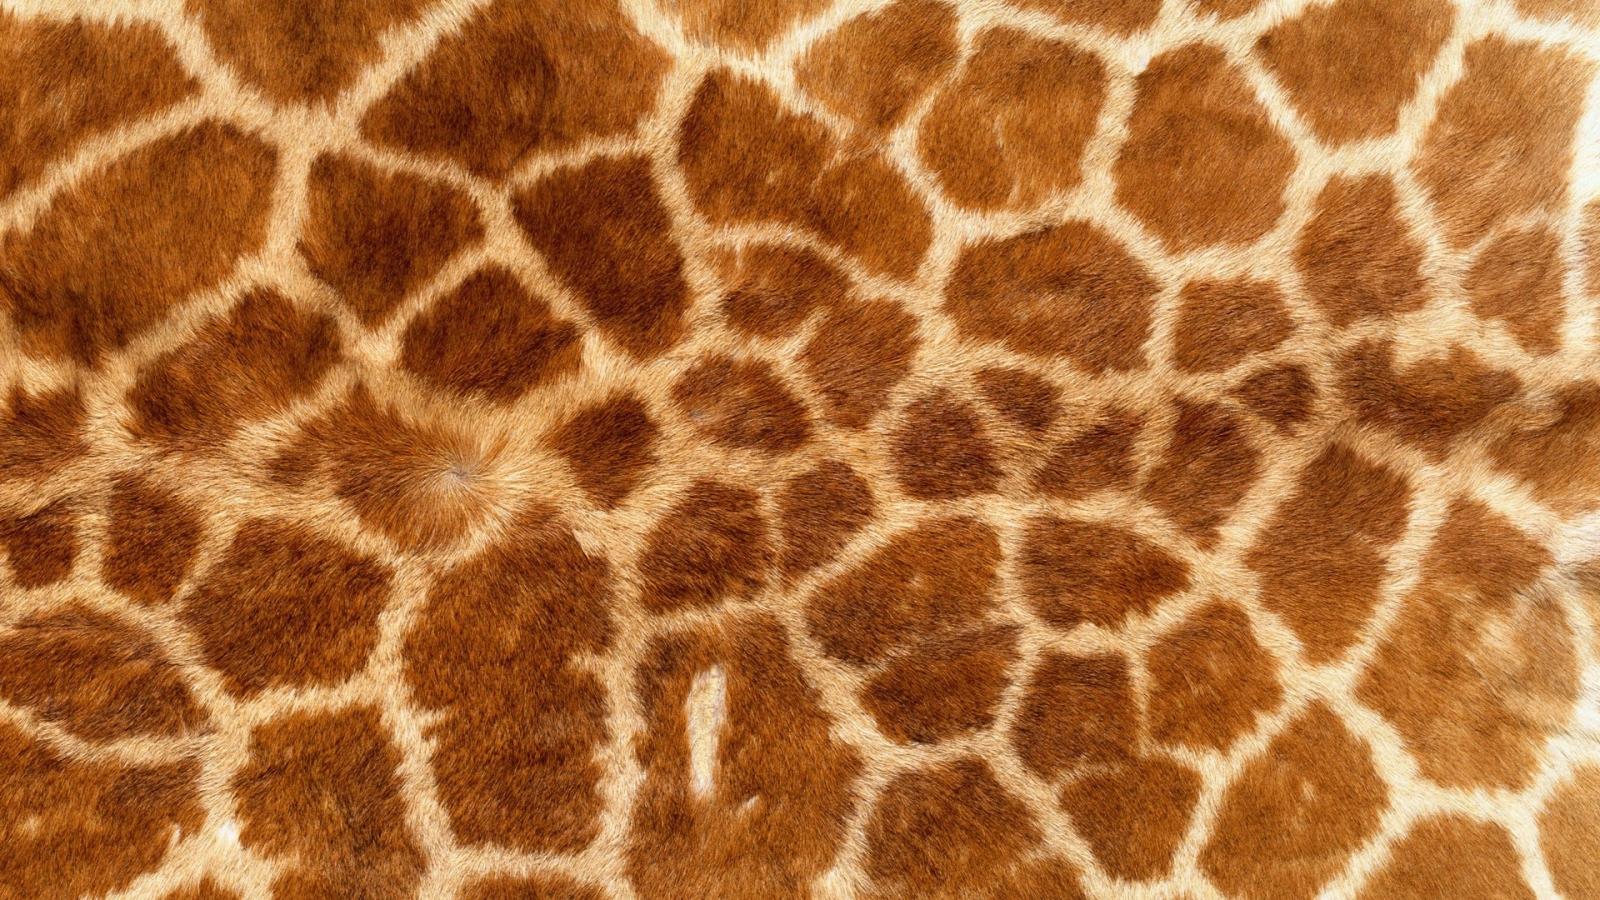 Textura de piel de jirafas - 1600x900